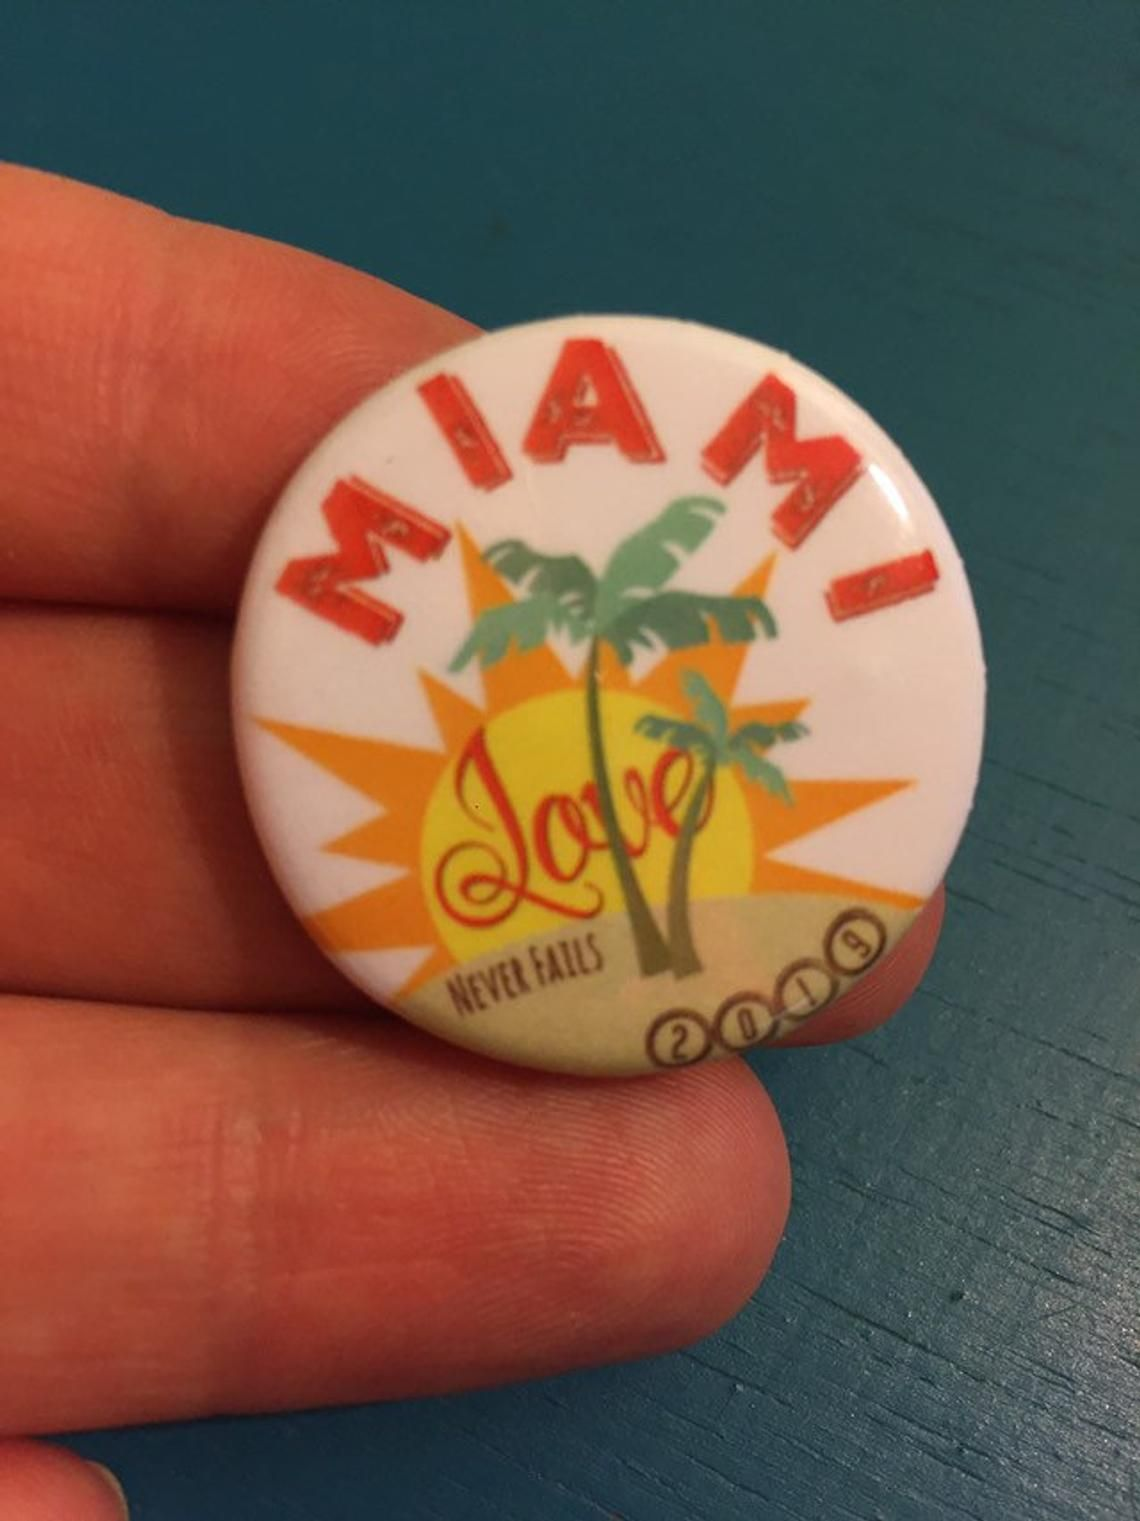 Miami florida love never fails 2019 international convention